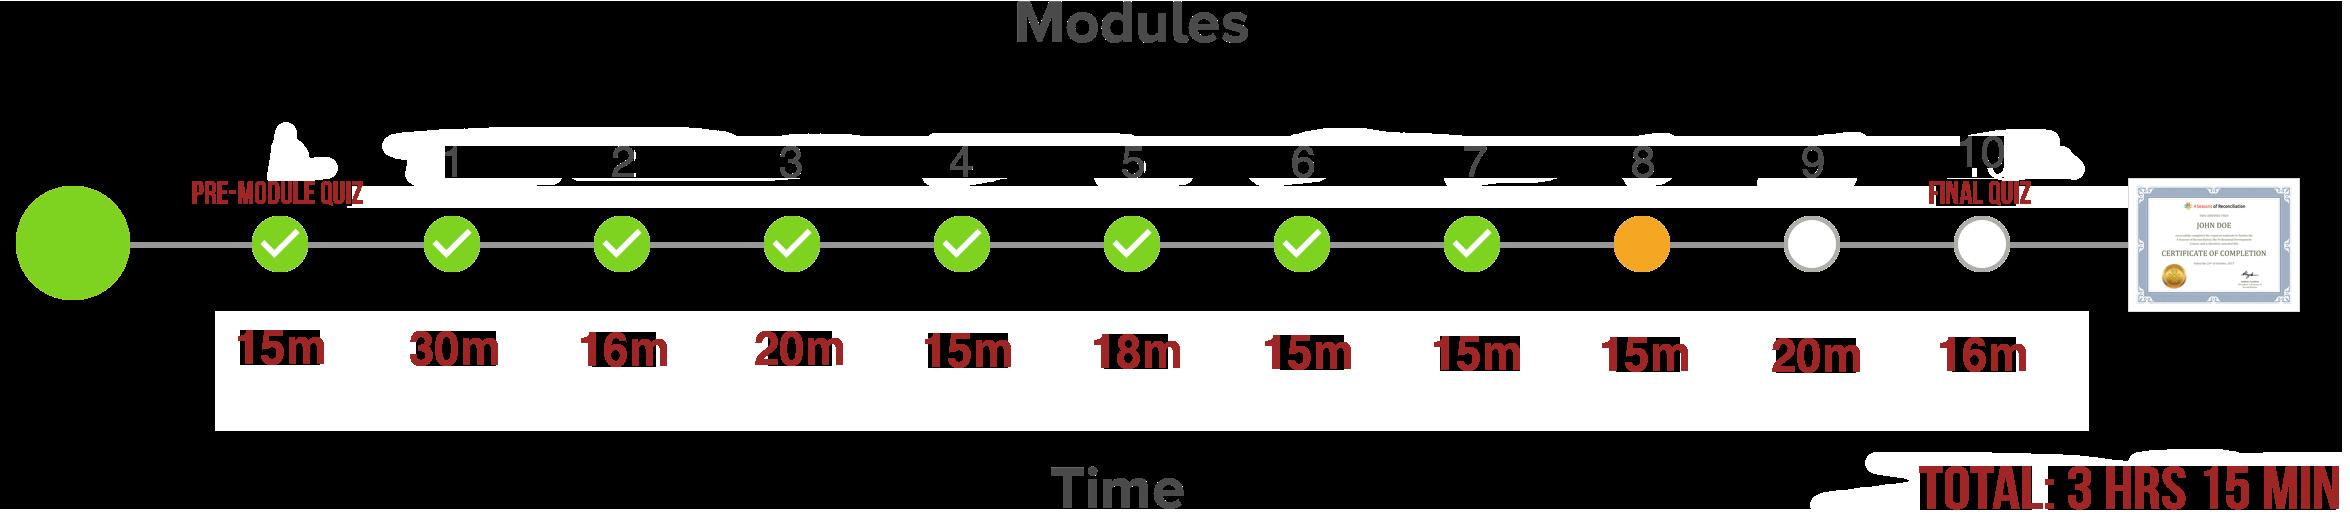 Module8_Orange.png